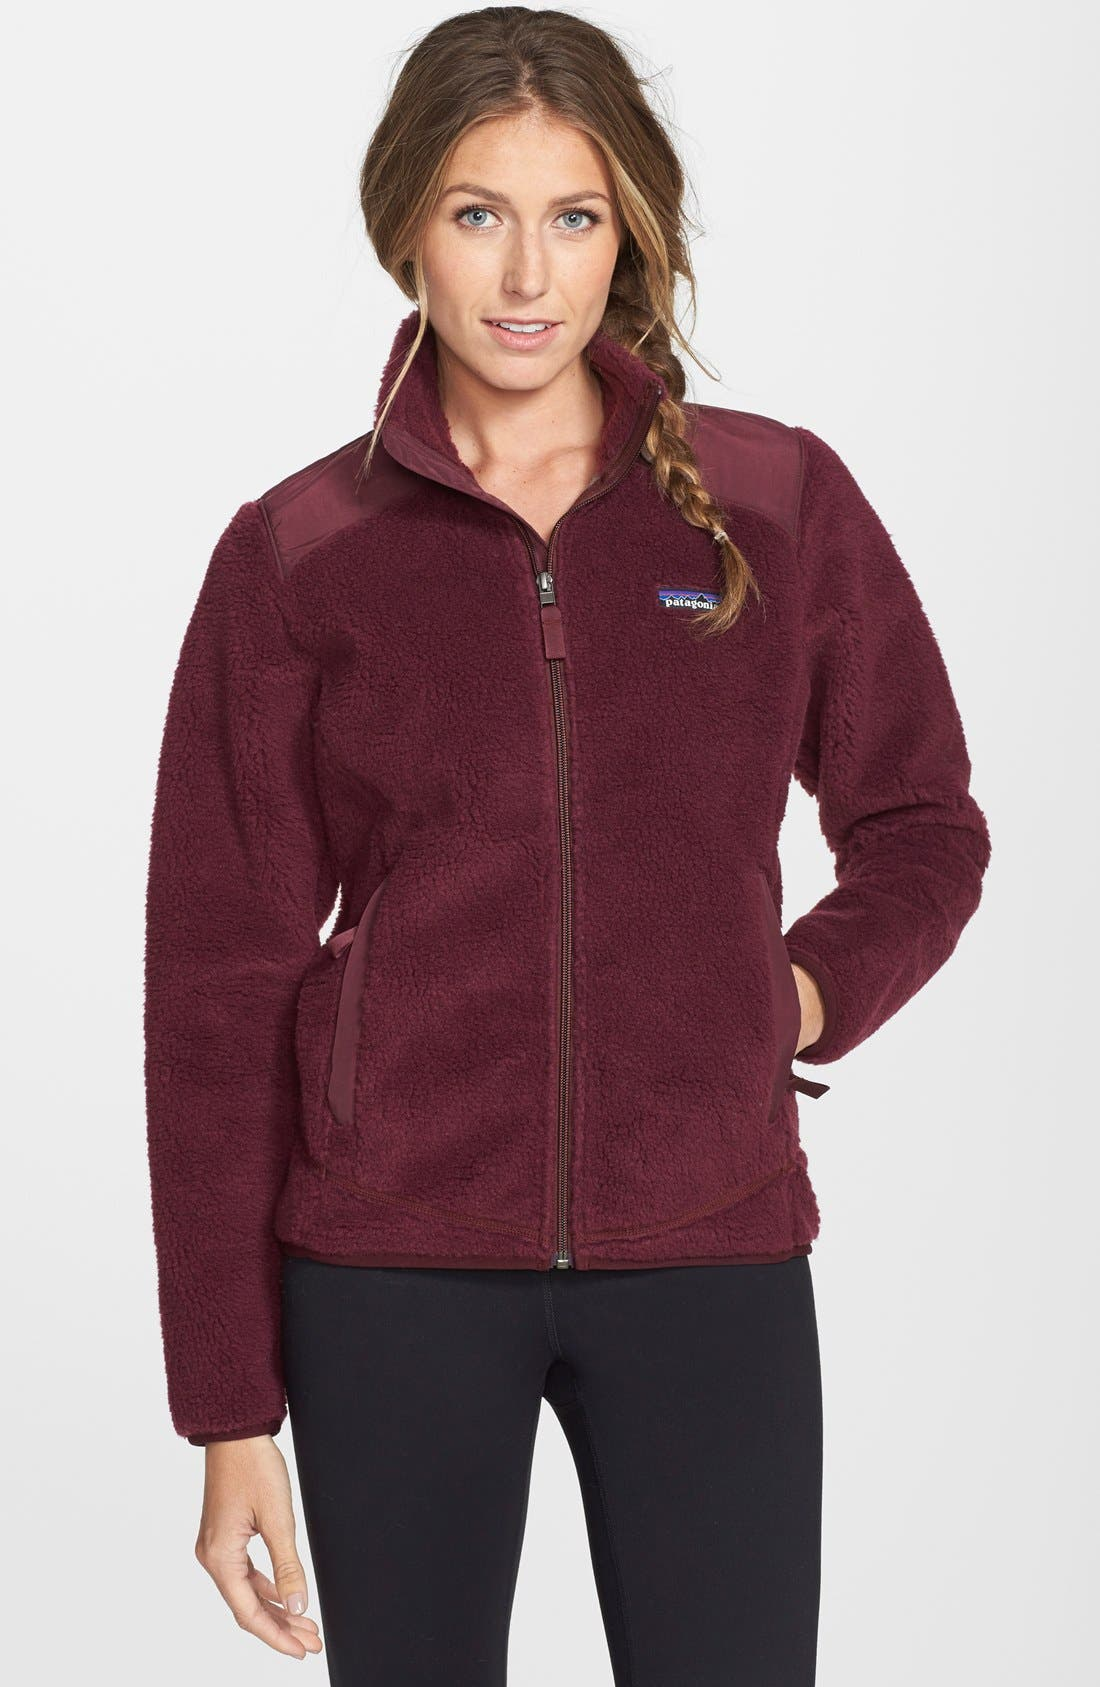 Main Image - Patagonia 'Retro-X' Fleece Jacket